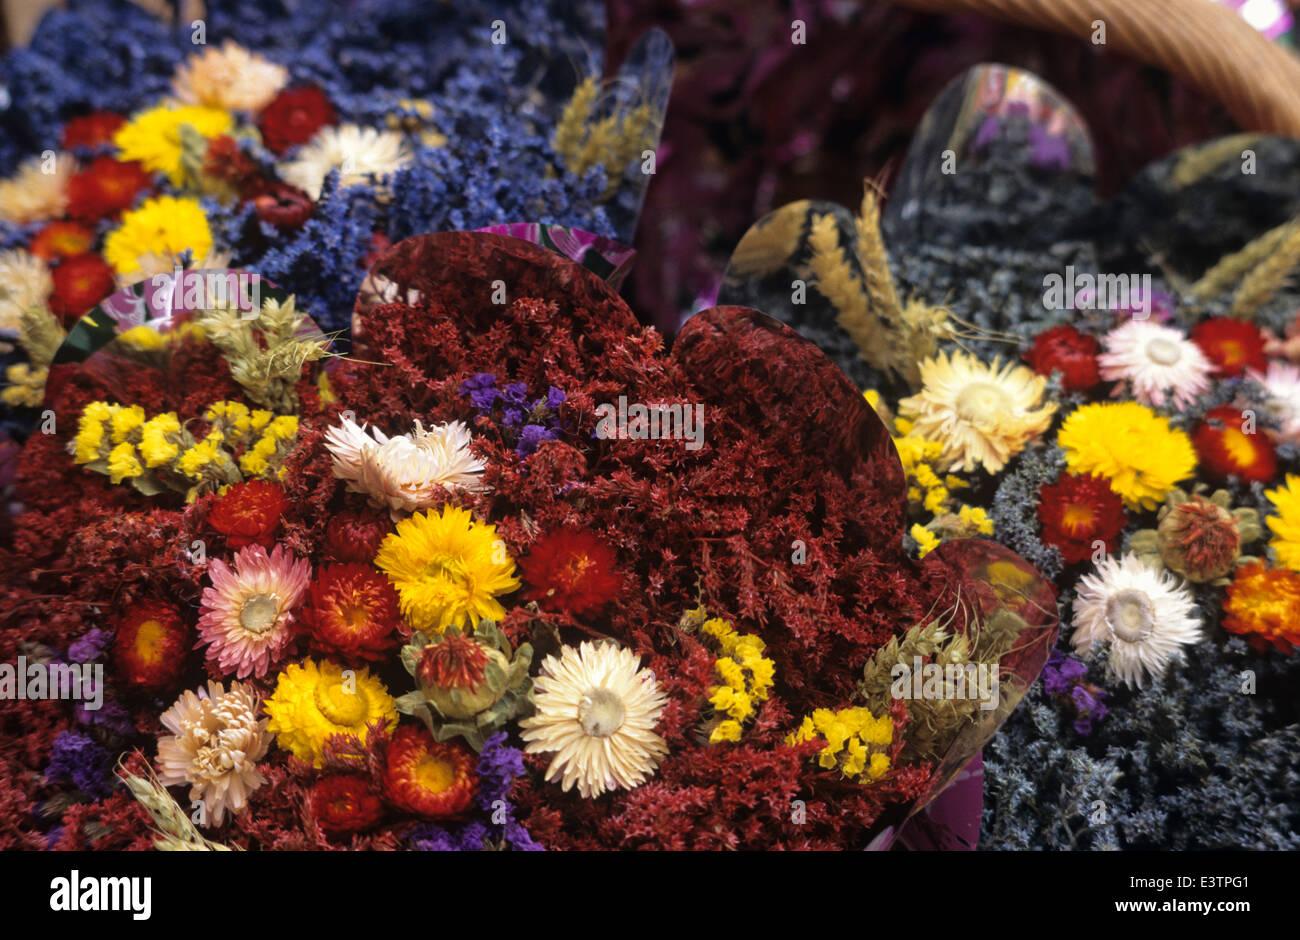 Dried flowers for sale at Les-Baux-de-Provence, France Stock Photo ...